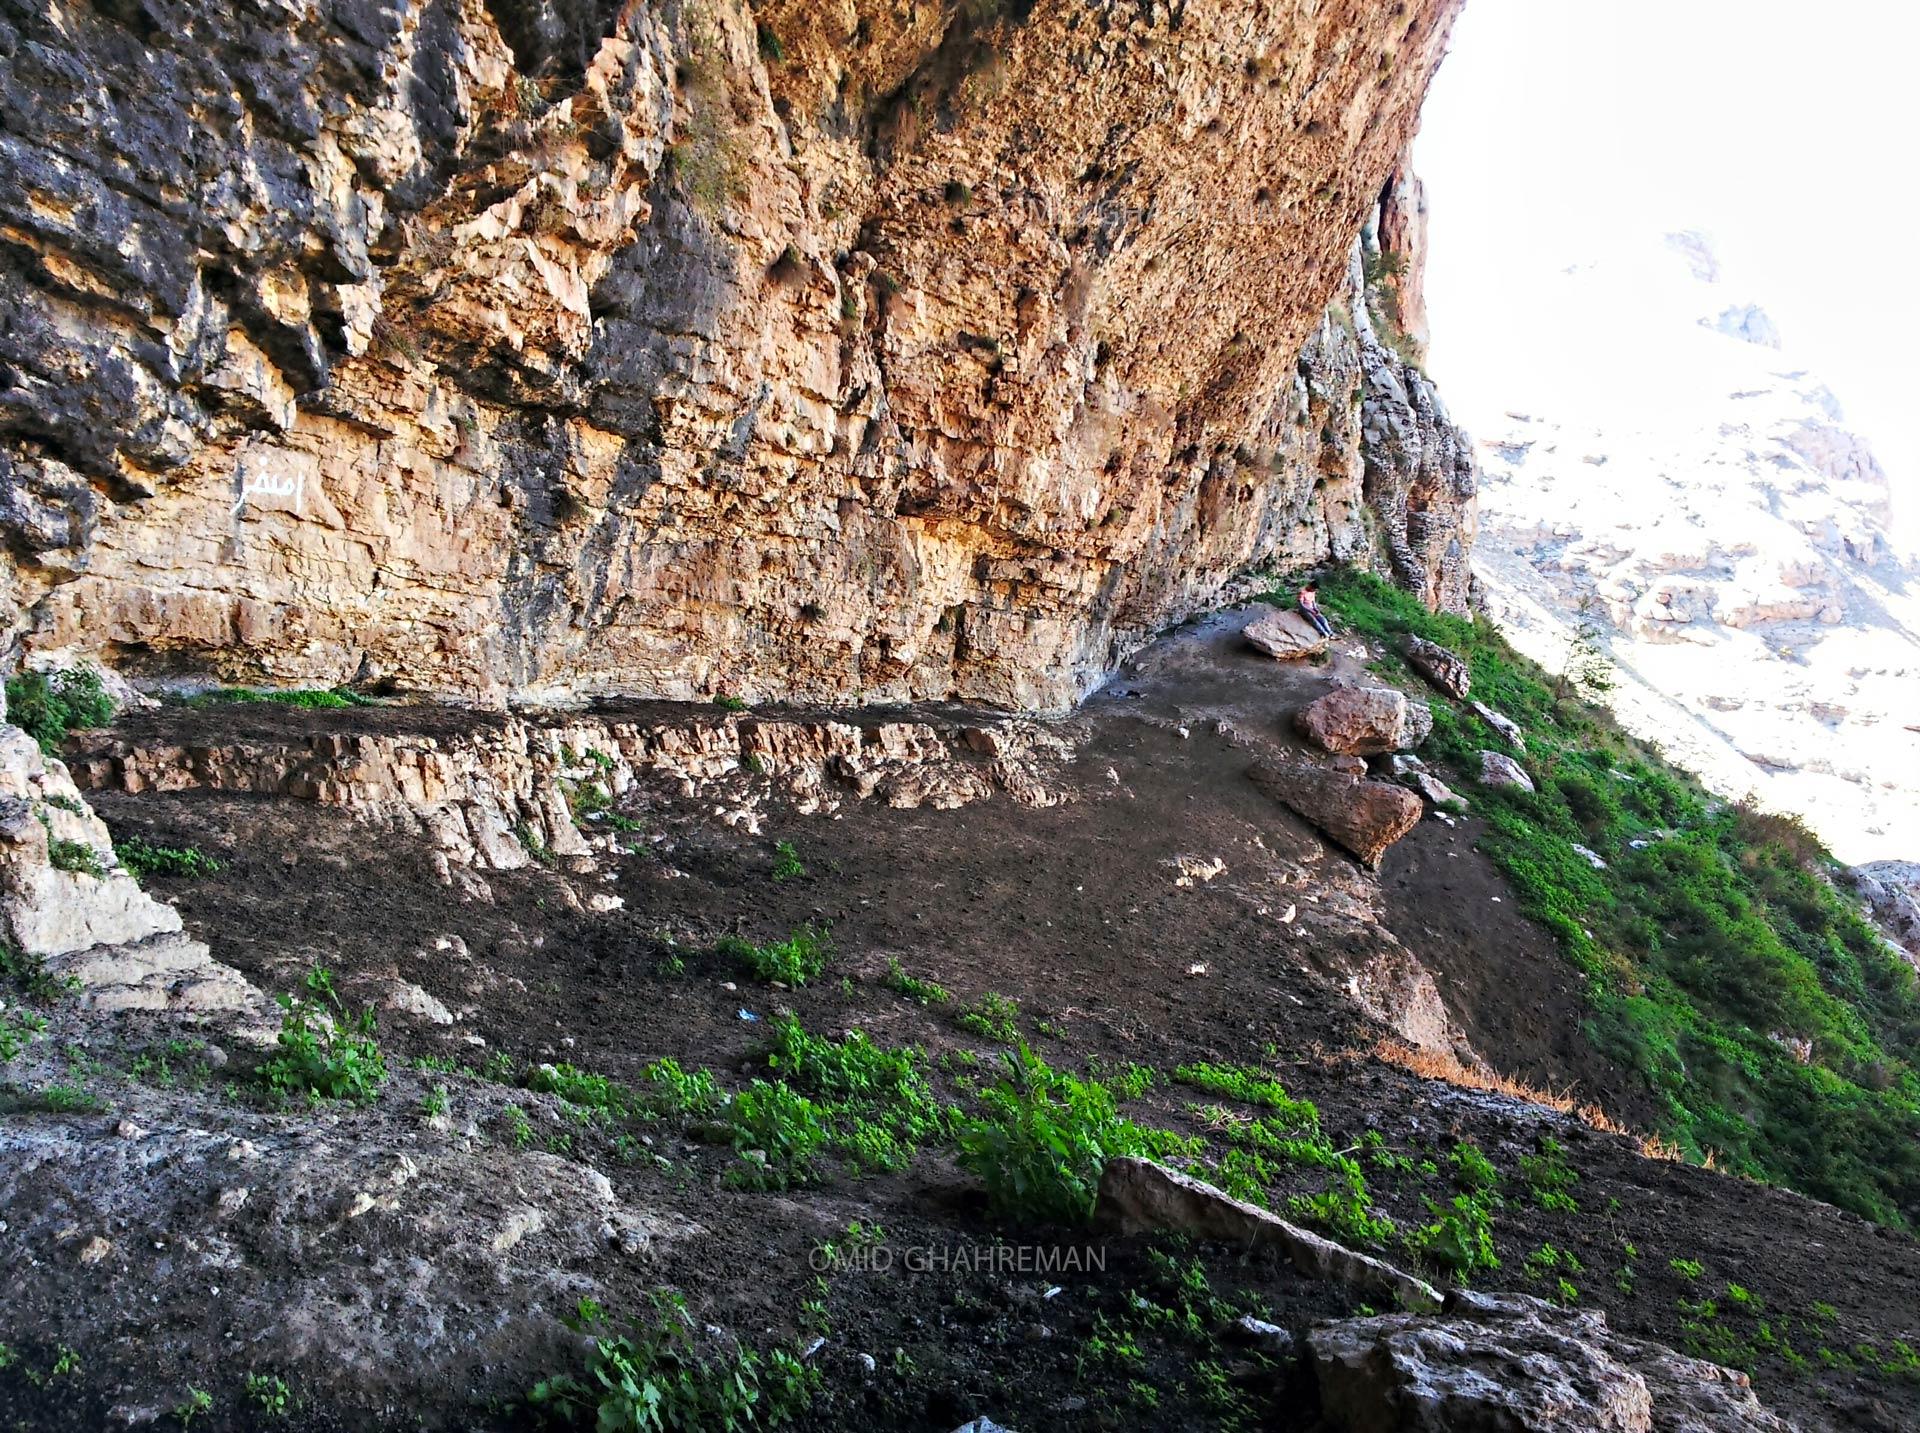 دیواره و قیه جنوبی شهر ماکو